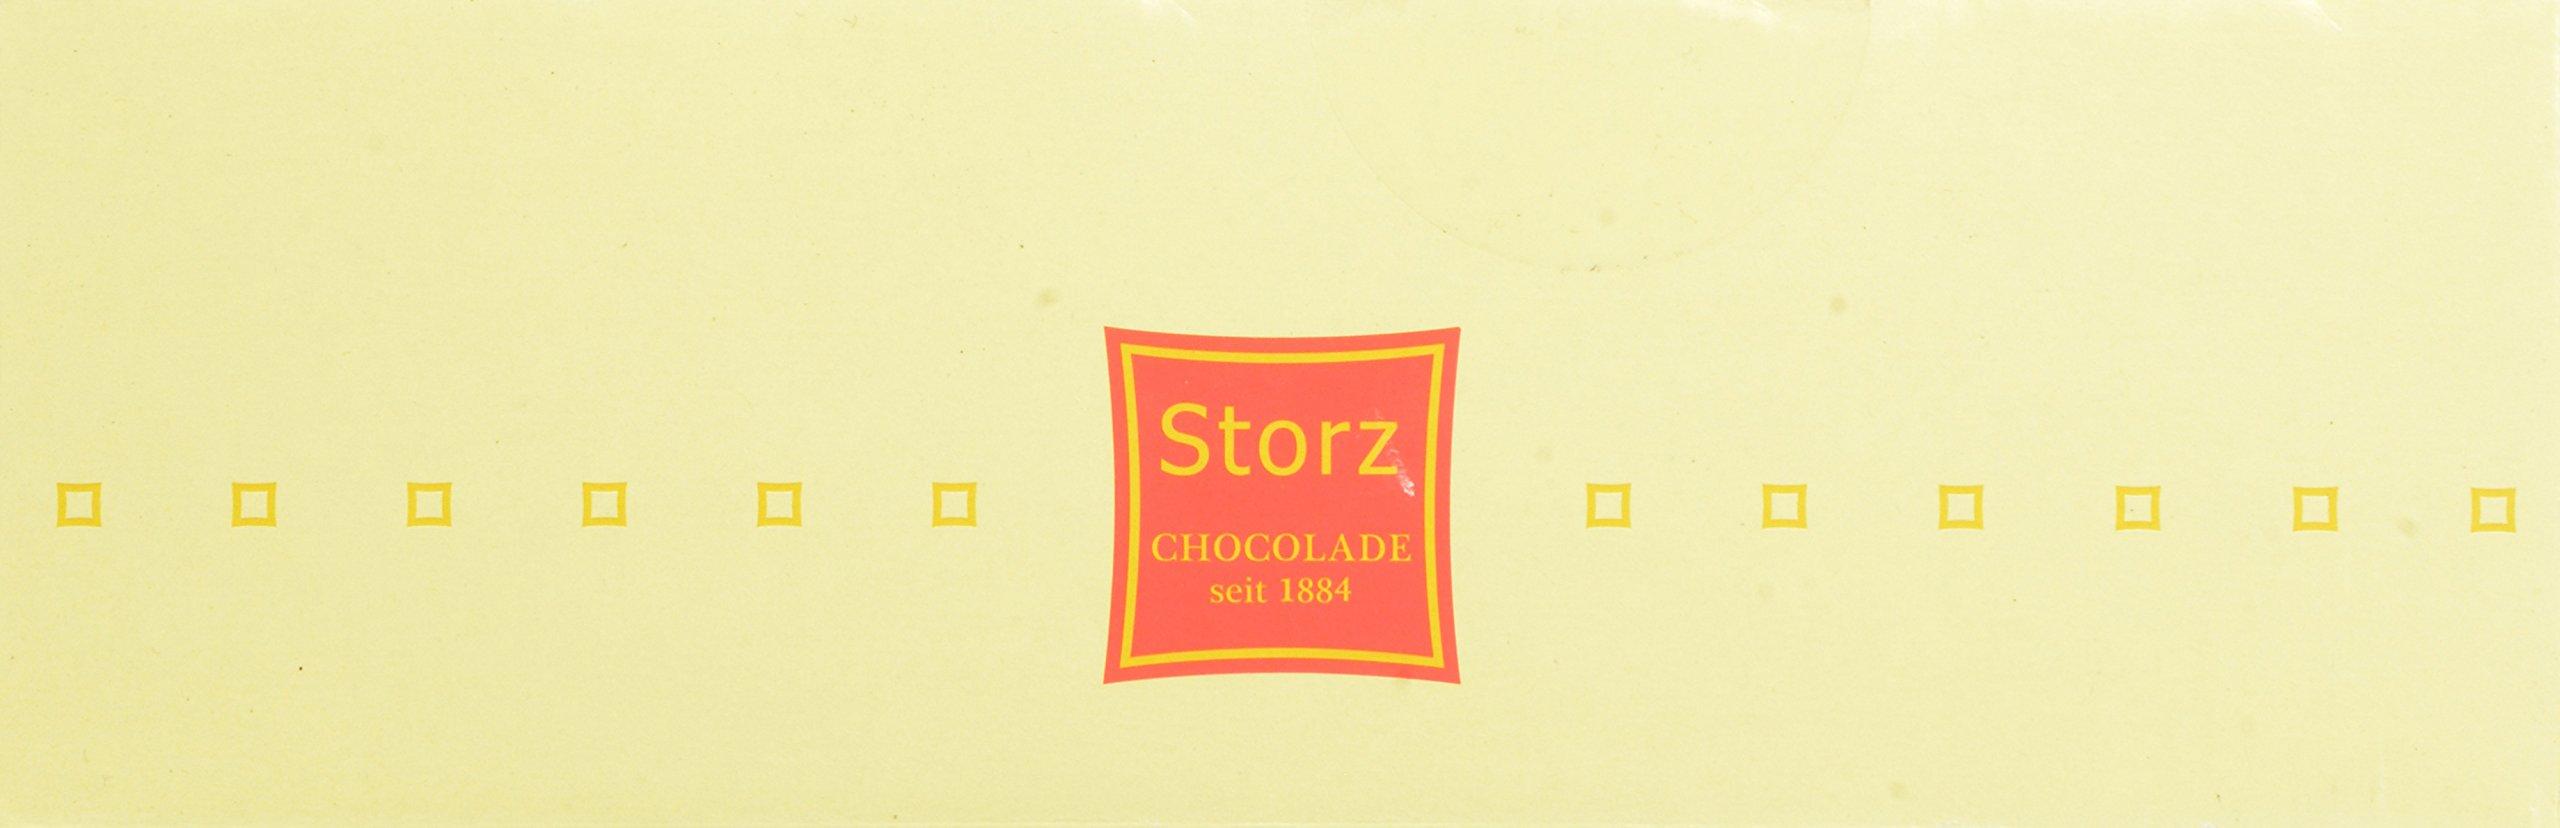 Storz Chocolate Large Solid Ladybug Candy 75 pcs per box, 0.44 Ounce